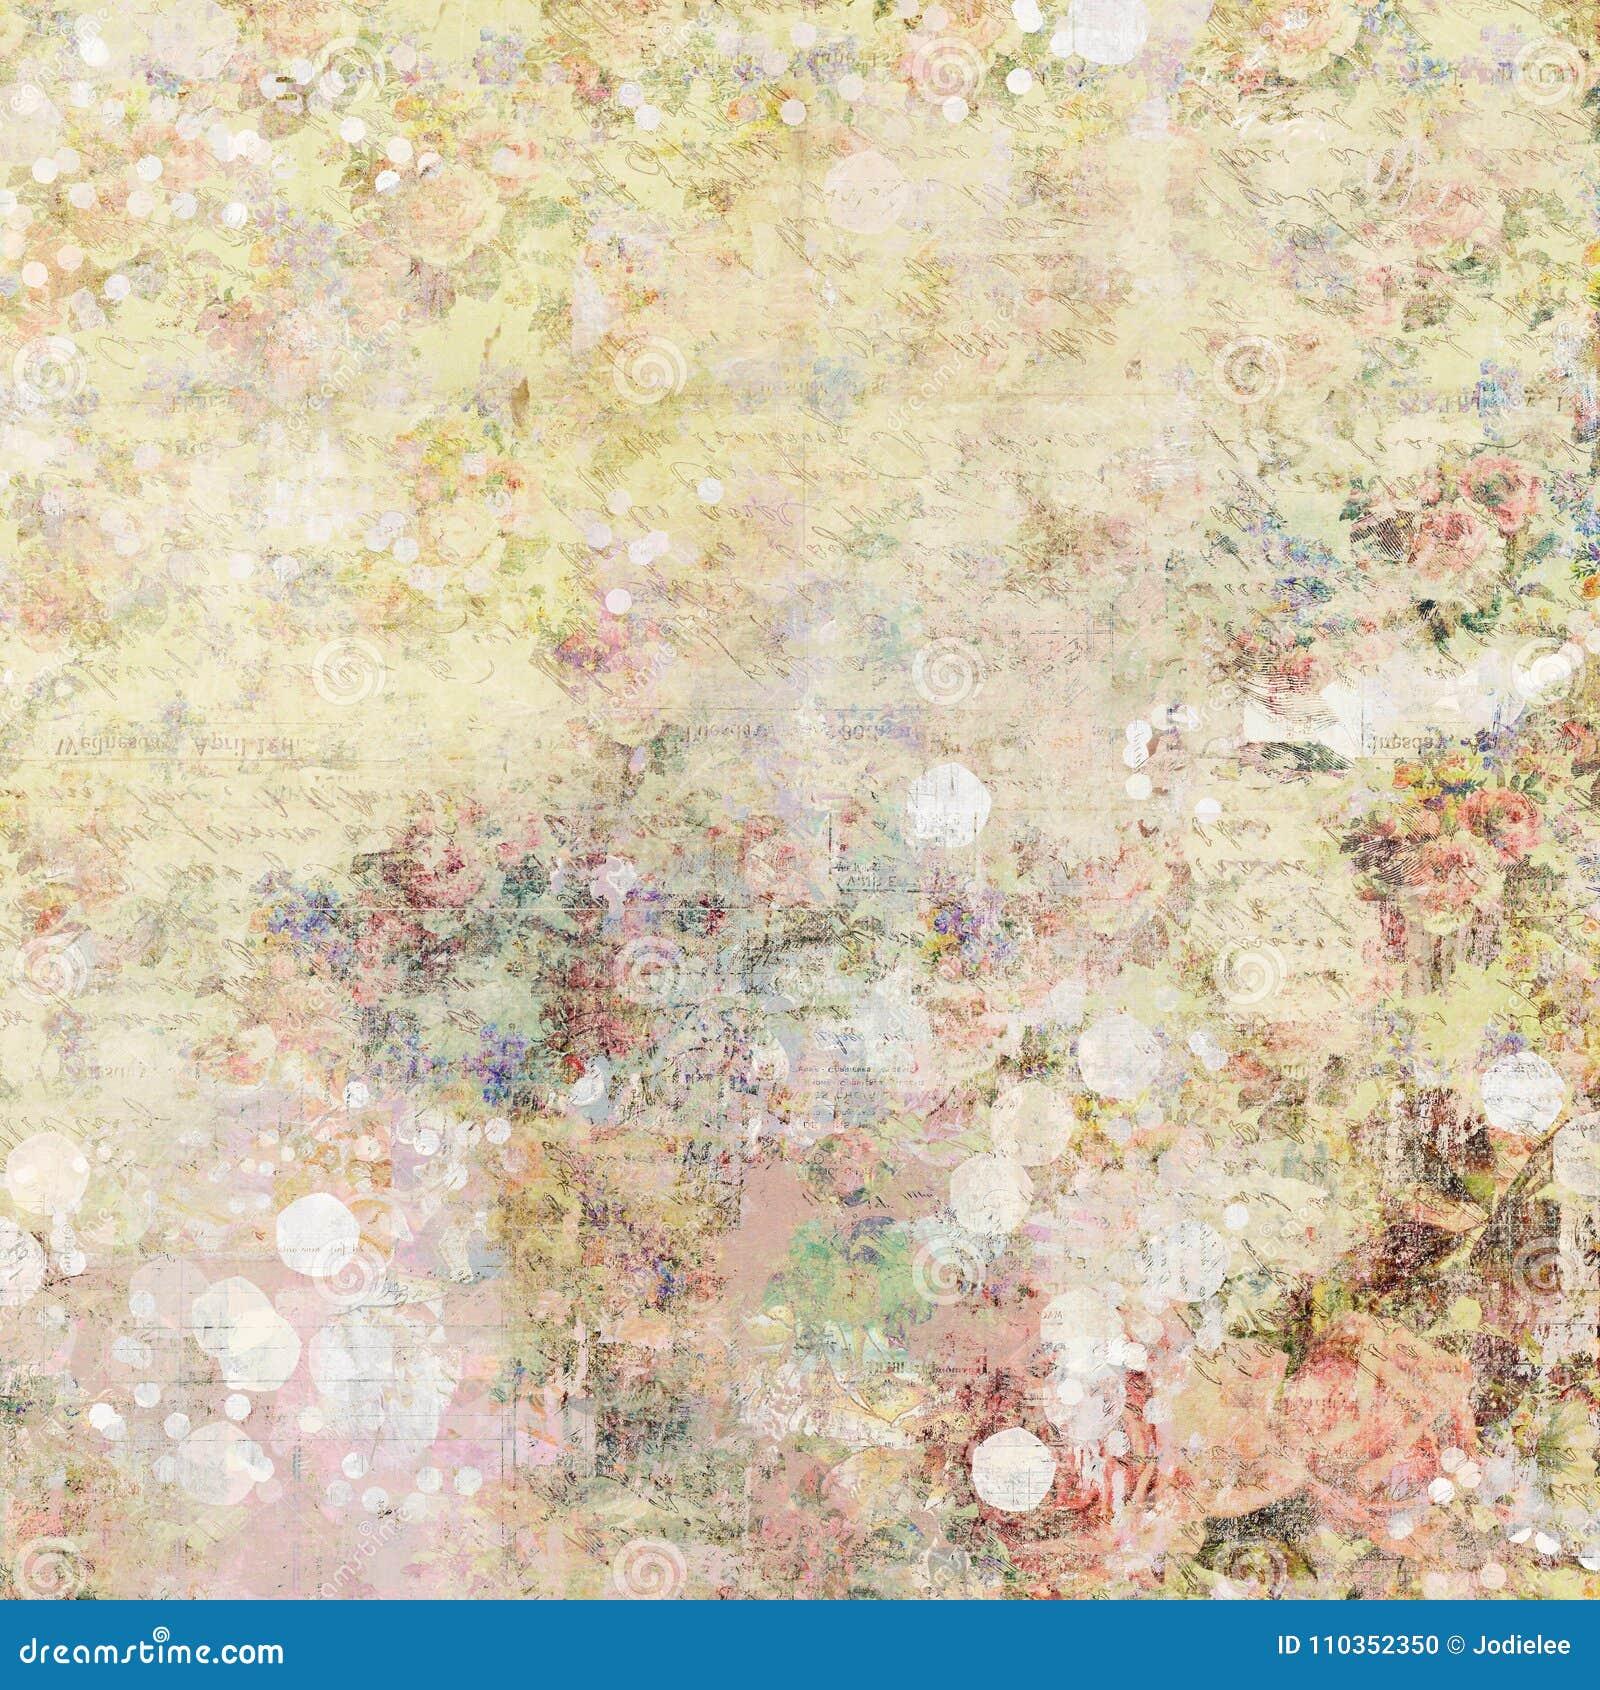 Fundo gráfico abstrato artístico chique gasto sujo do vintage antigo floral aciganado boêmio com rosas